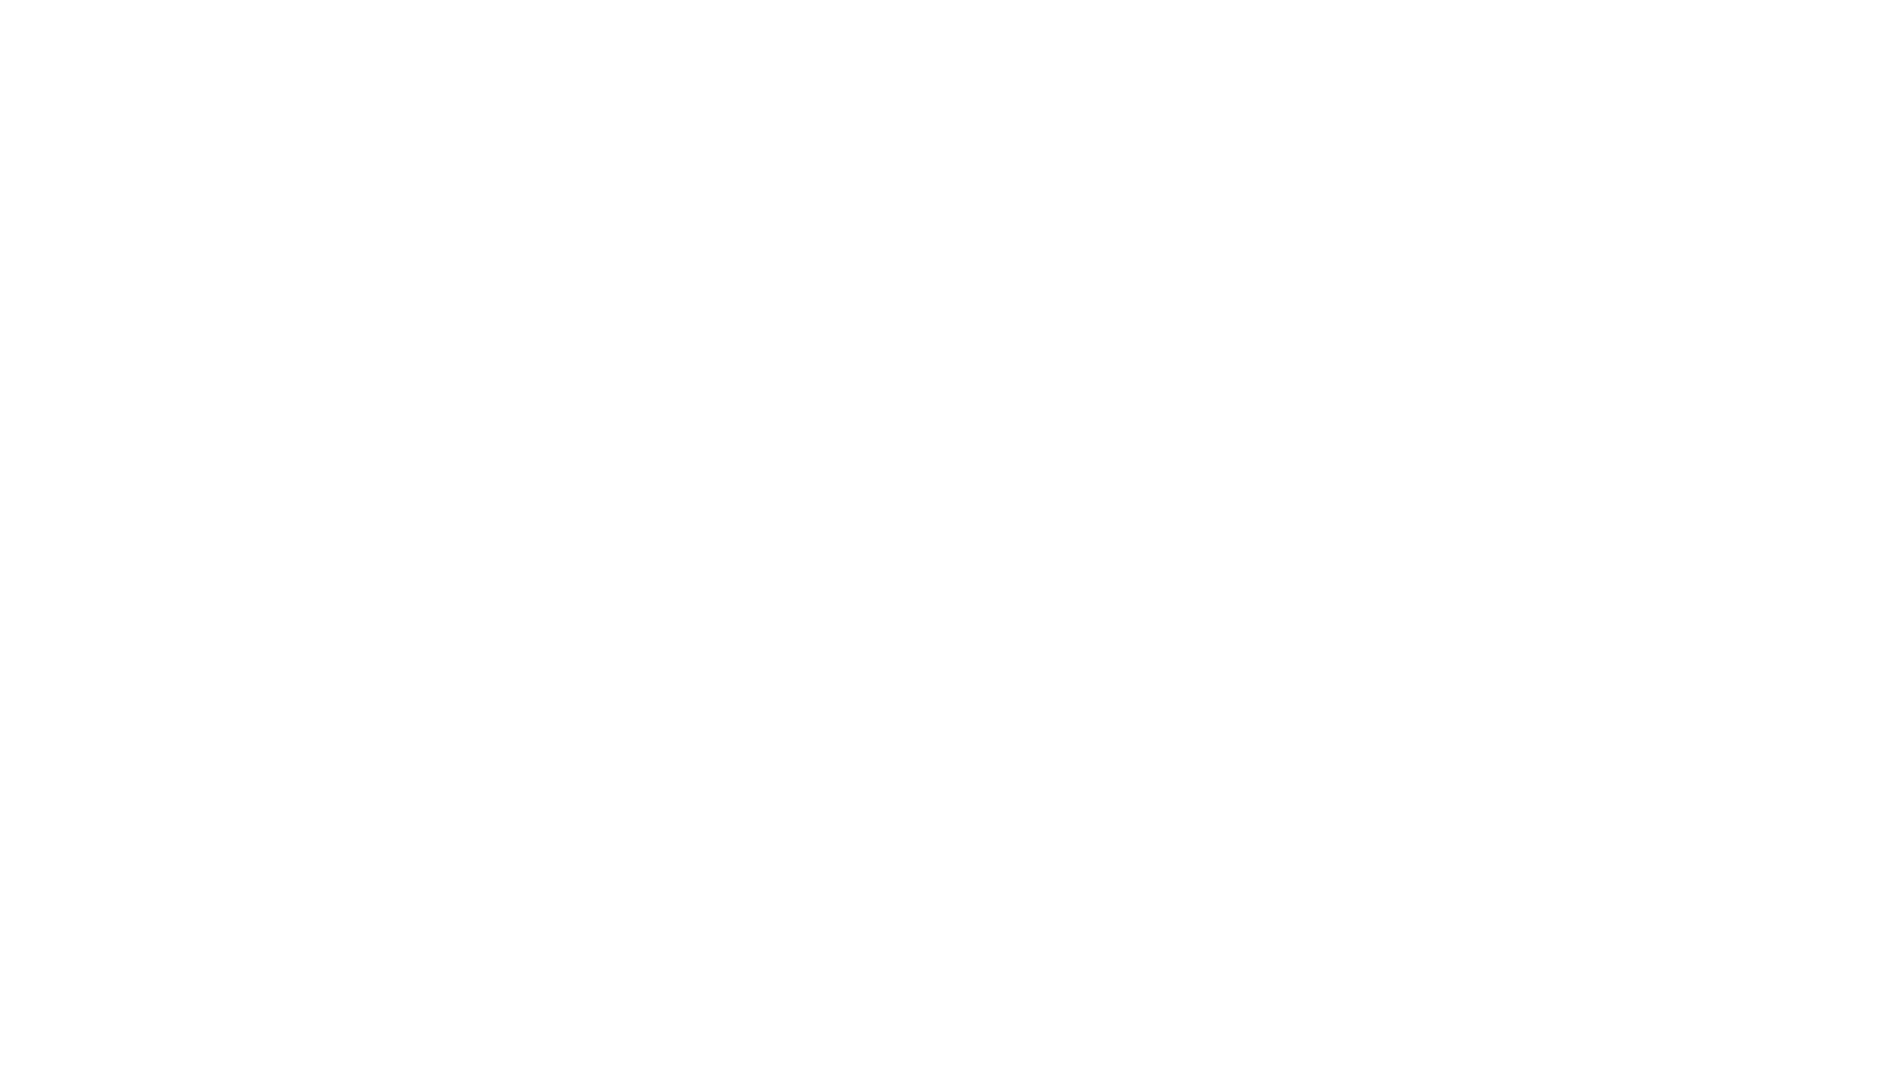 120FPS By Ingaf